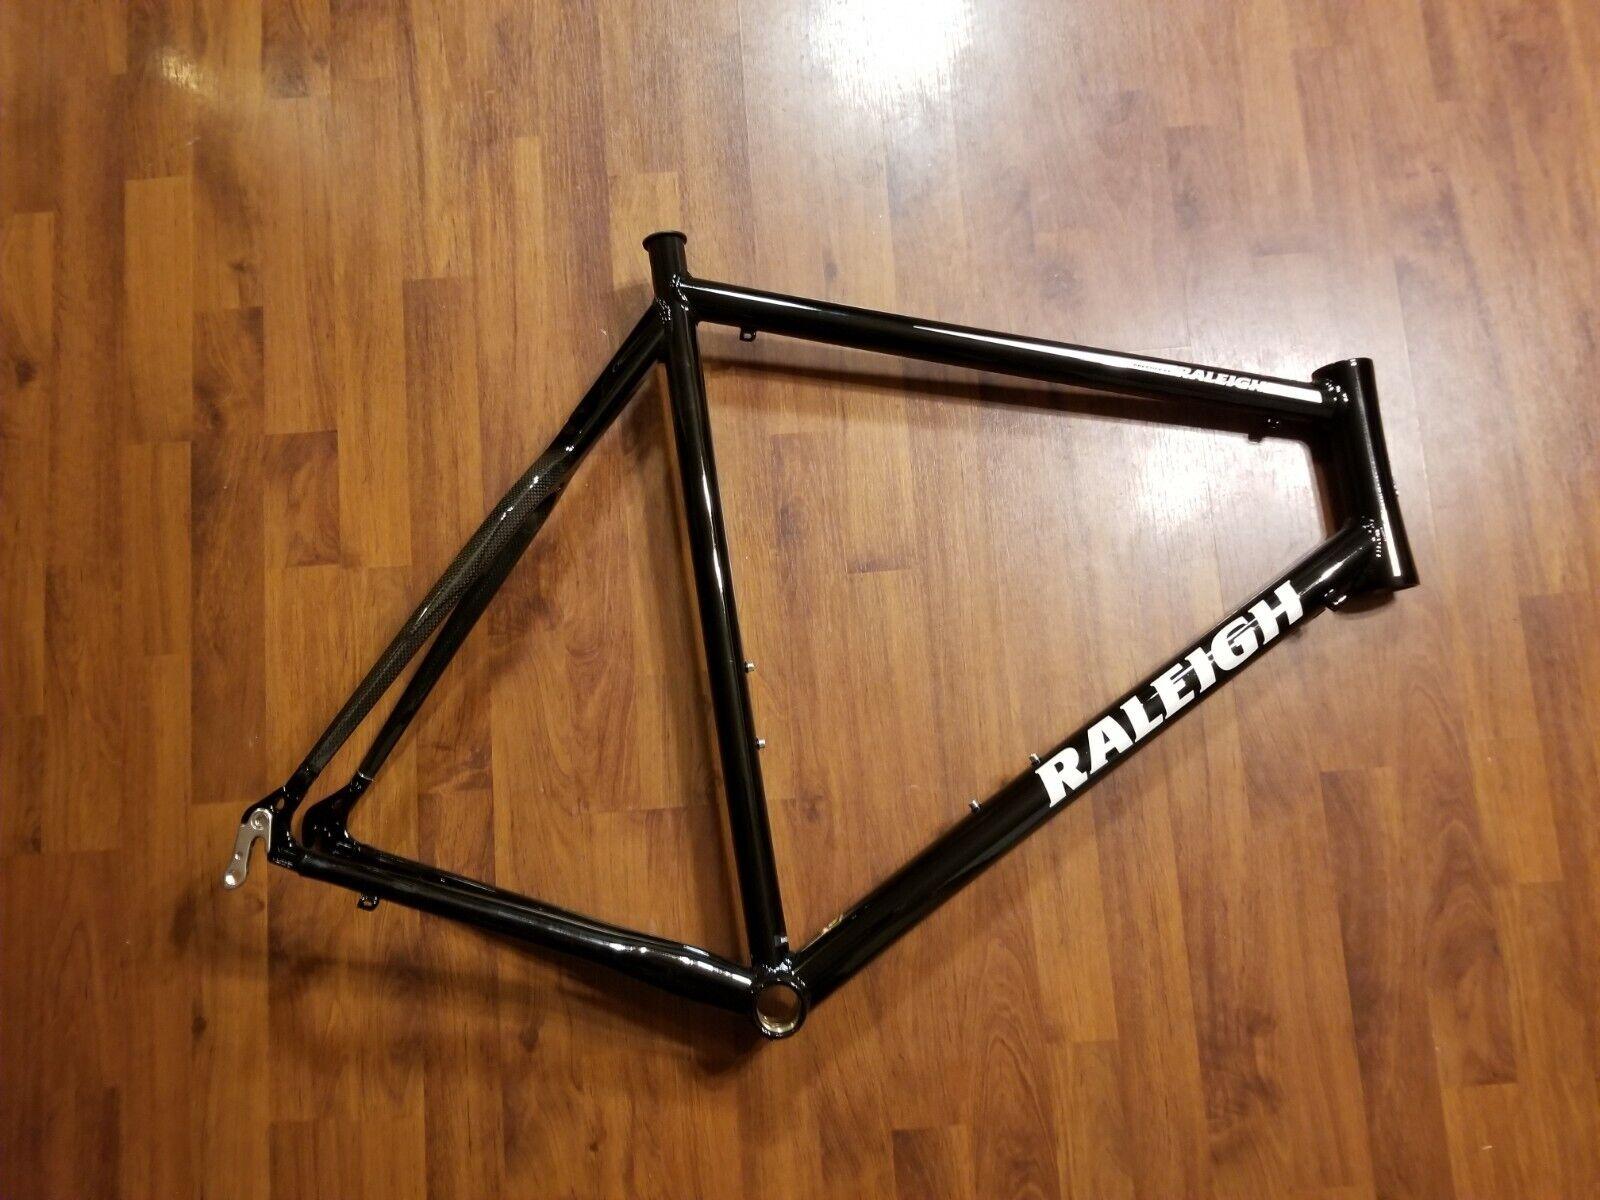 Raleigh Raleigh Raleigh Prestige EX Road Bike Frame - 700c Aluminum 62cm Carbon Upper Chainstay 67f2c3